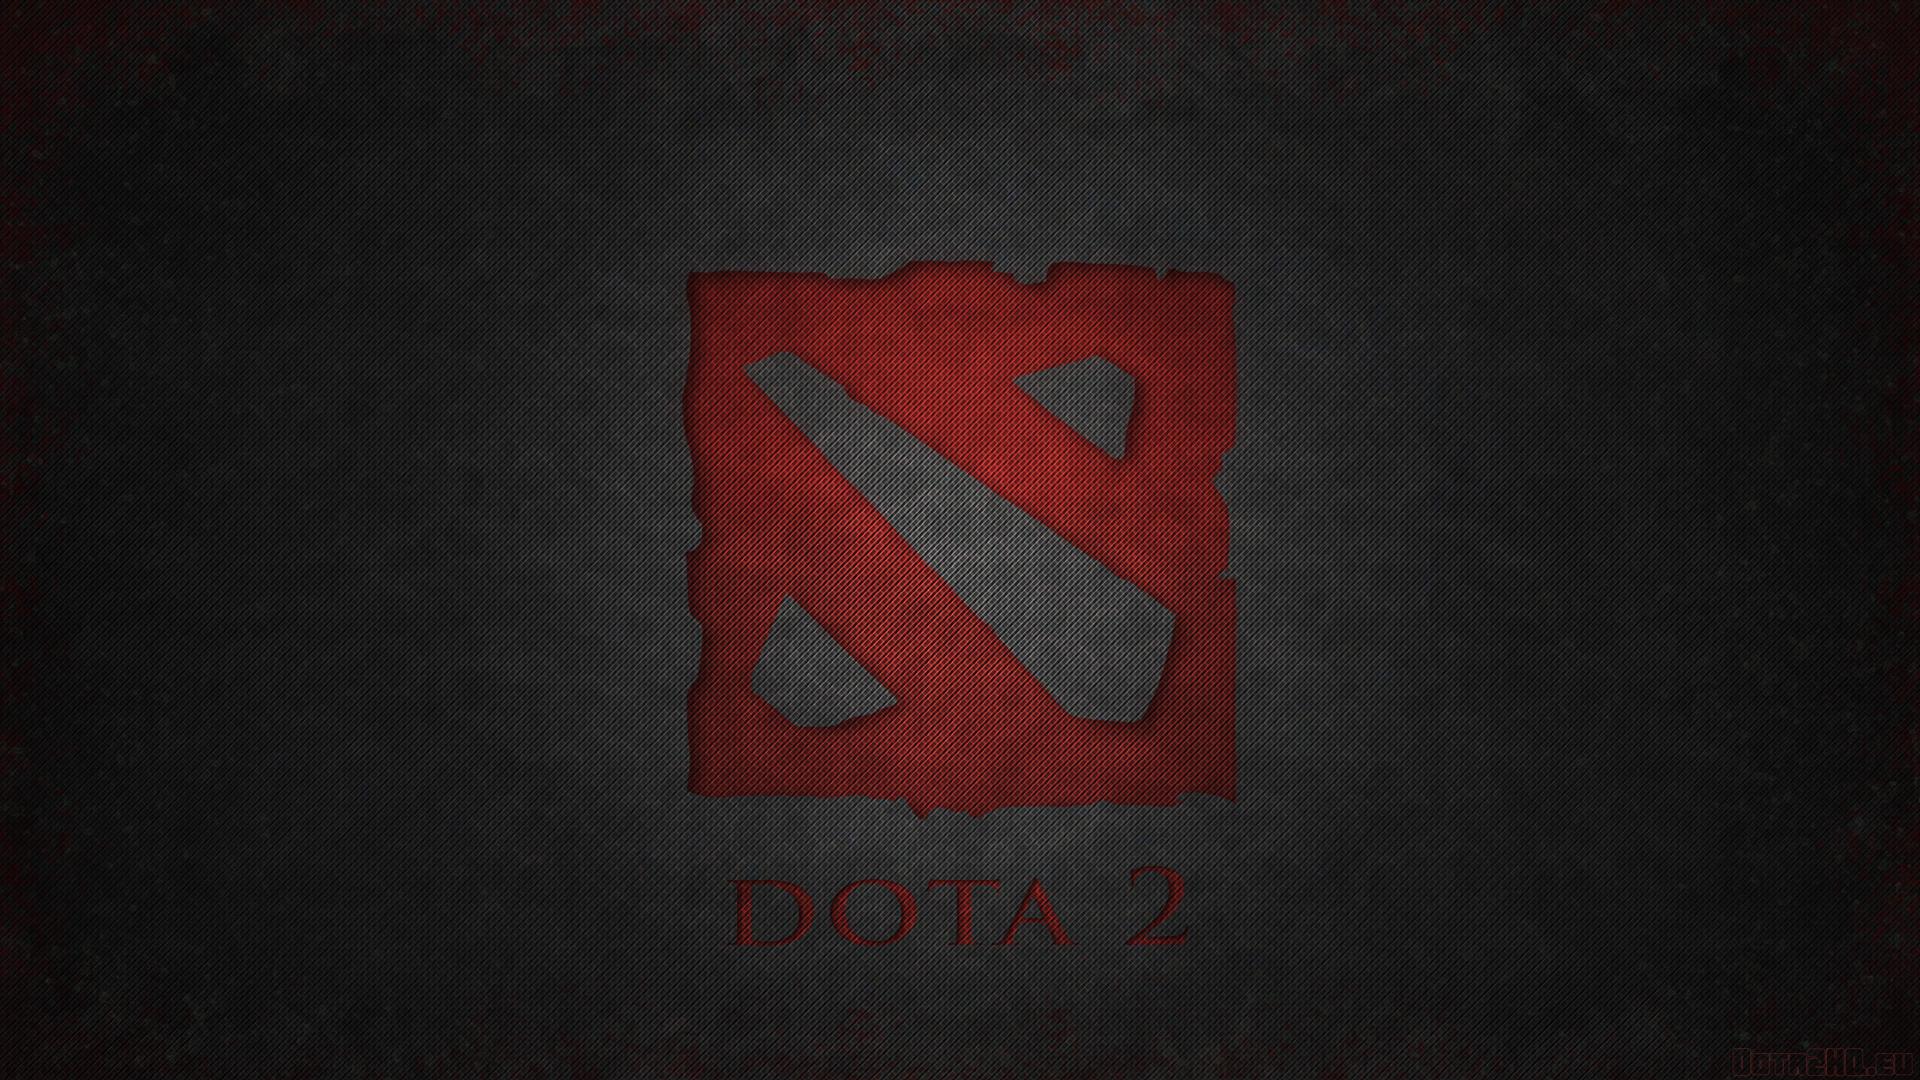 download dota 2 art logo 800x600 resolution full hd wallpaper